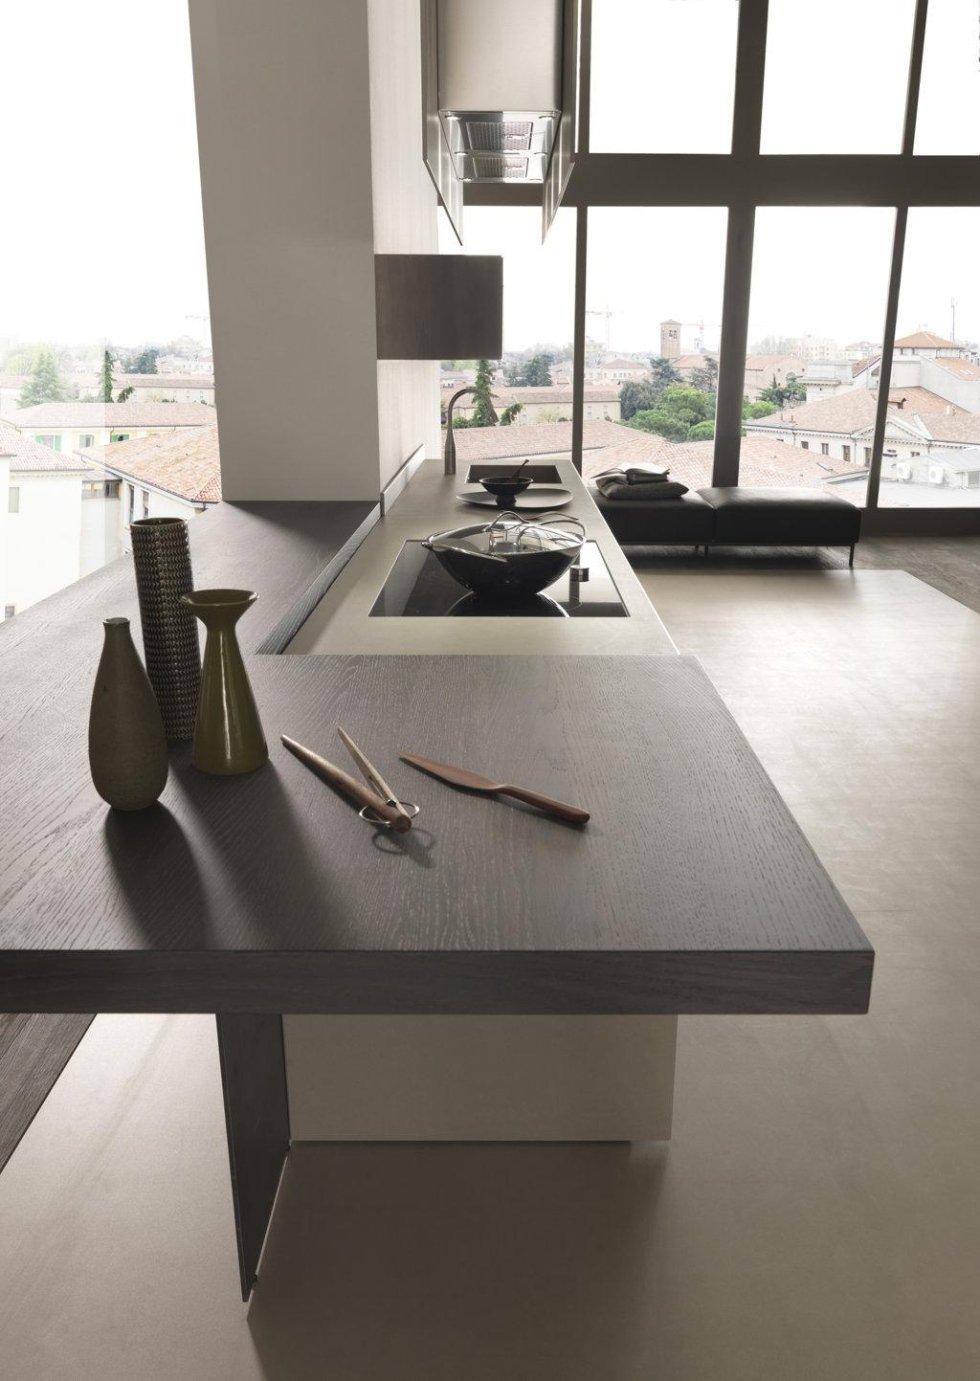 oggetti su bancone di una cucina moderna